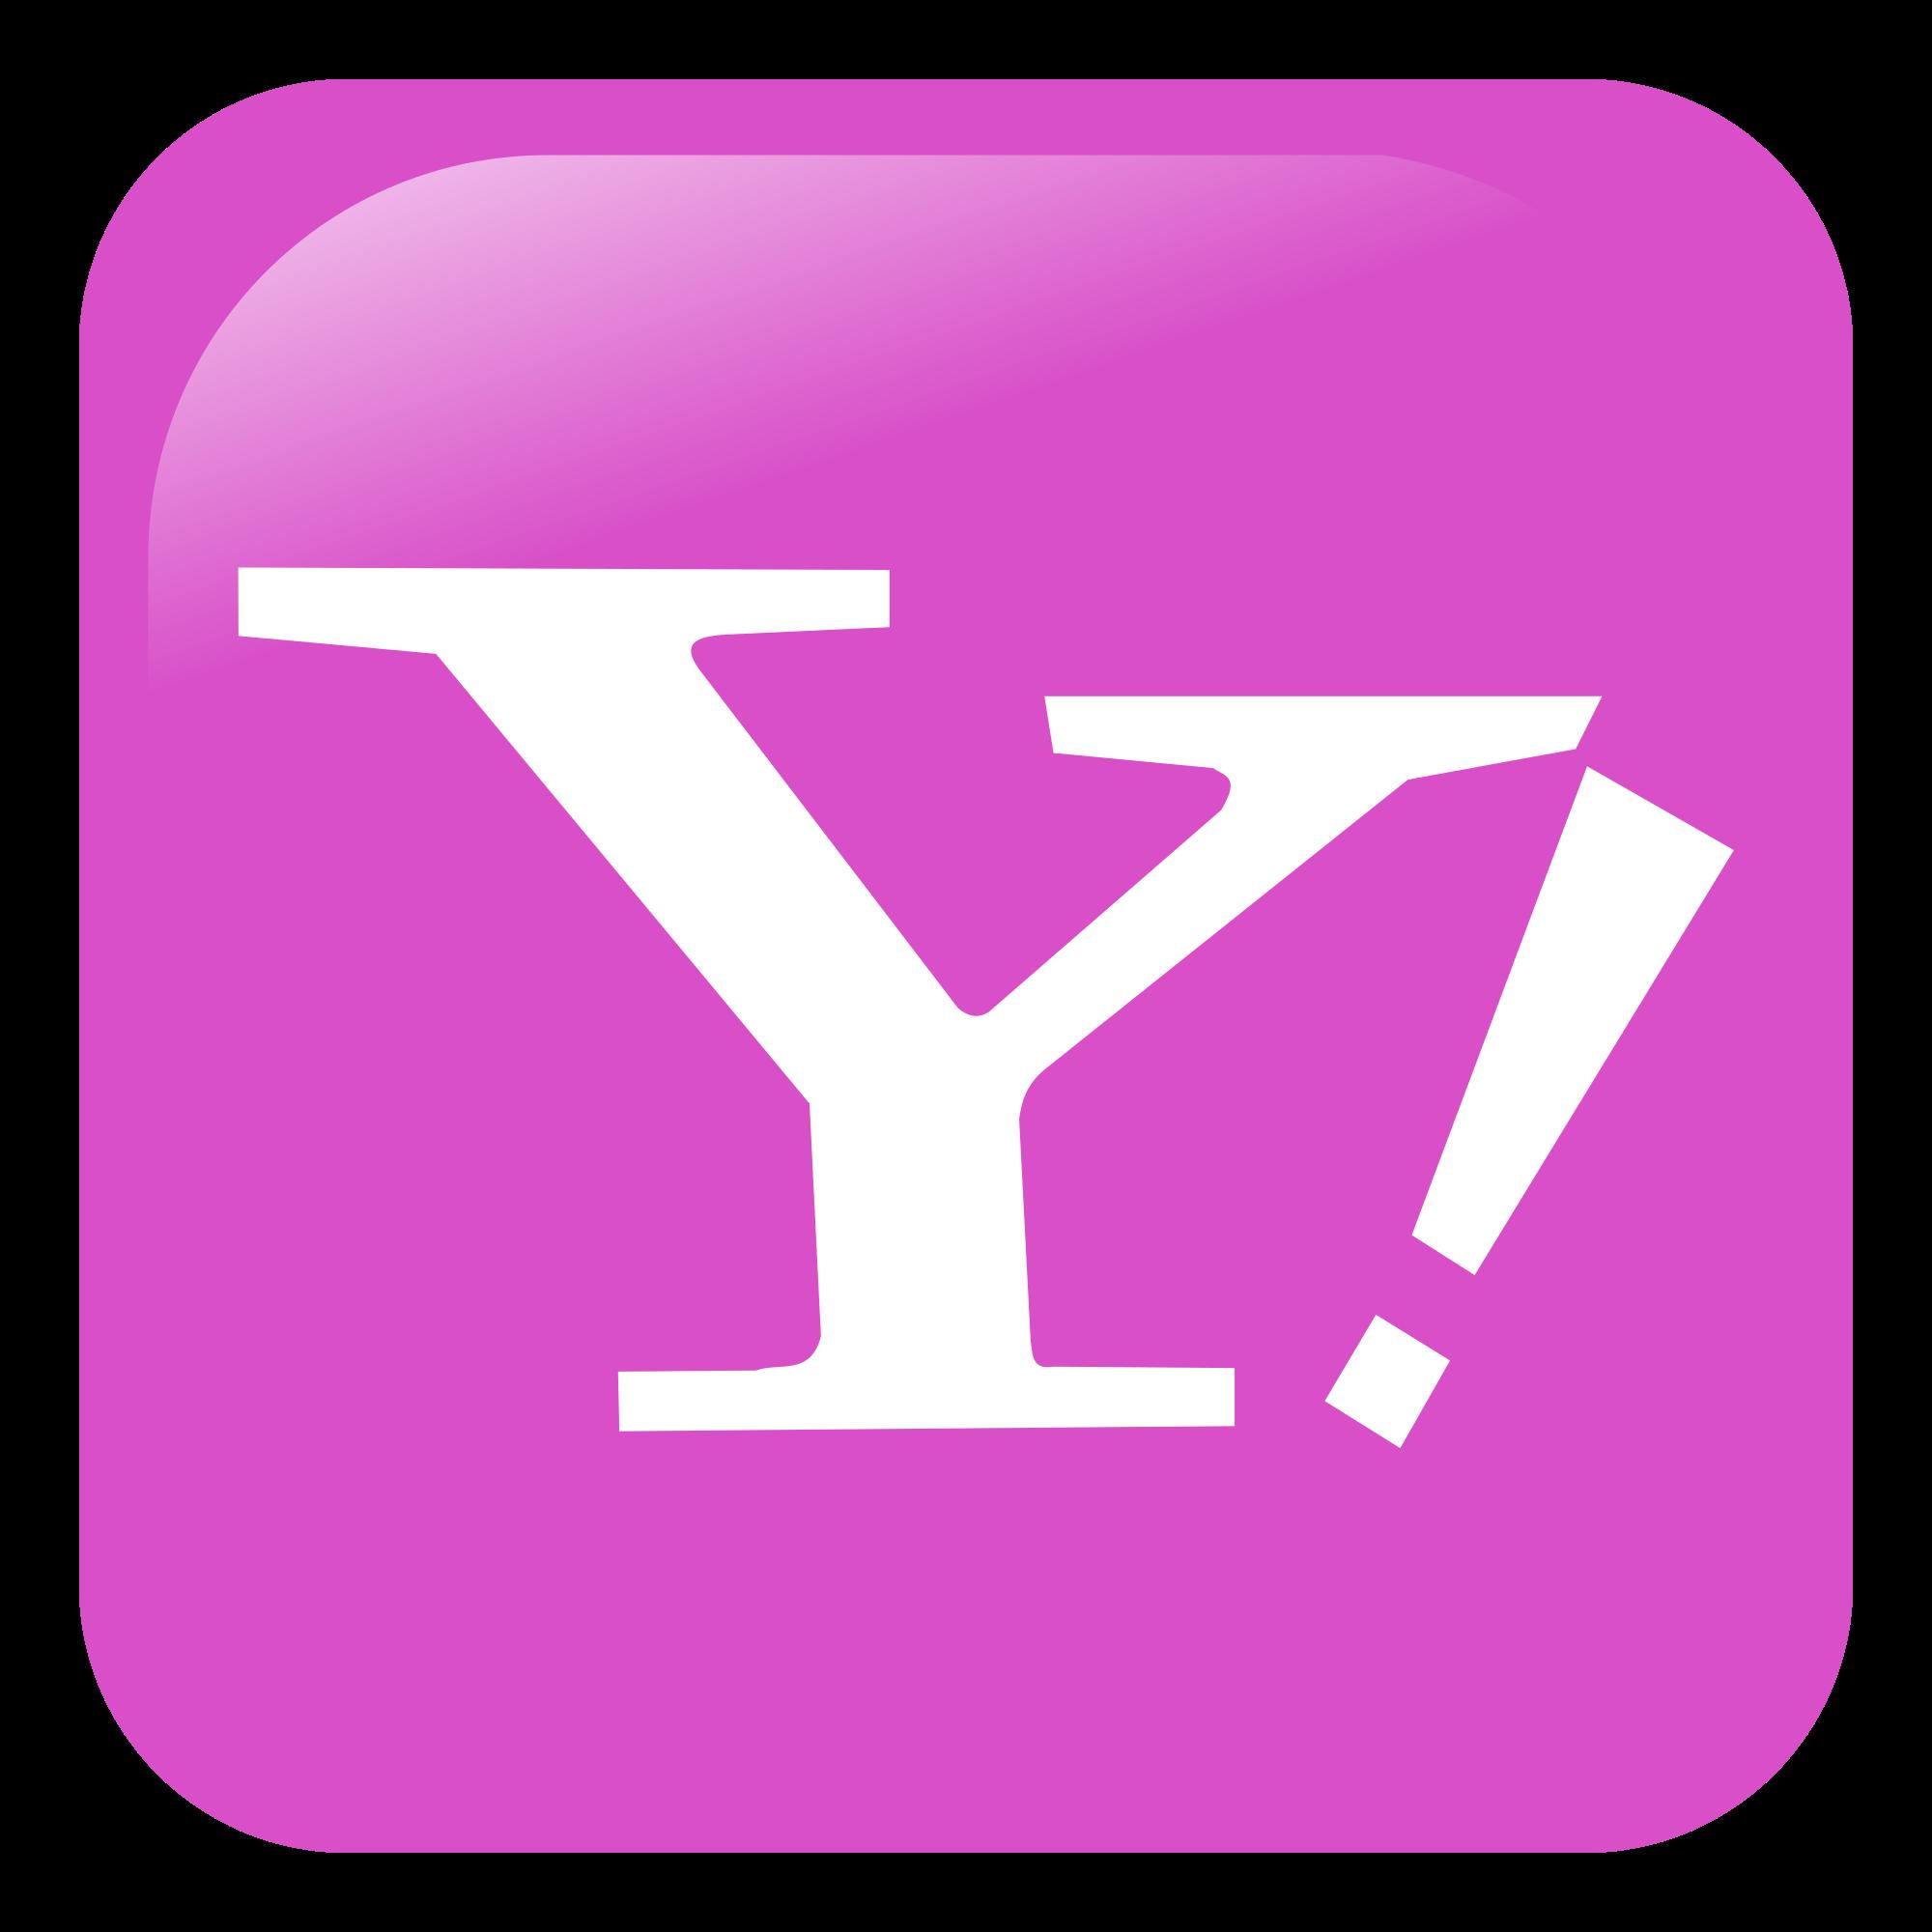 Yahoo Old Logo Vector PNG - 40109